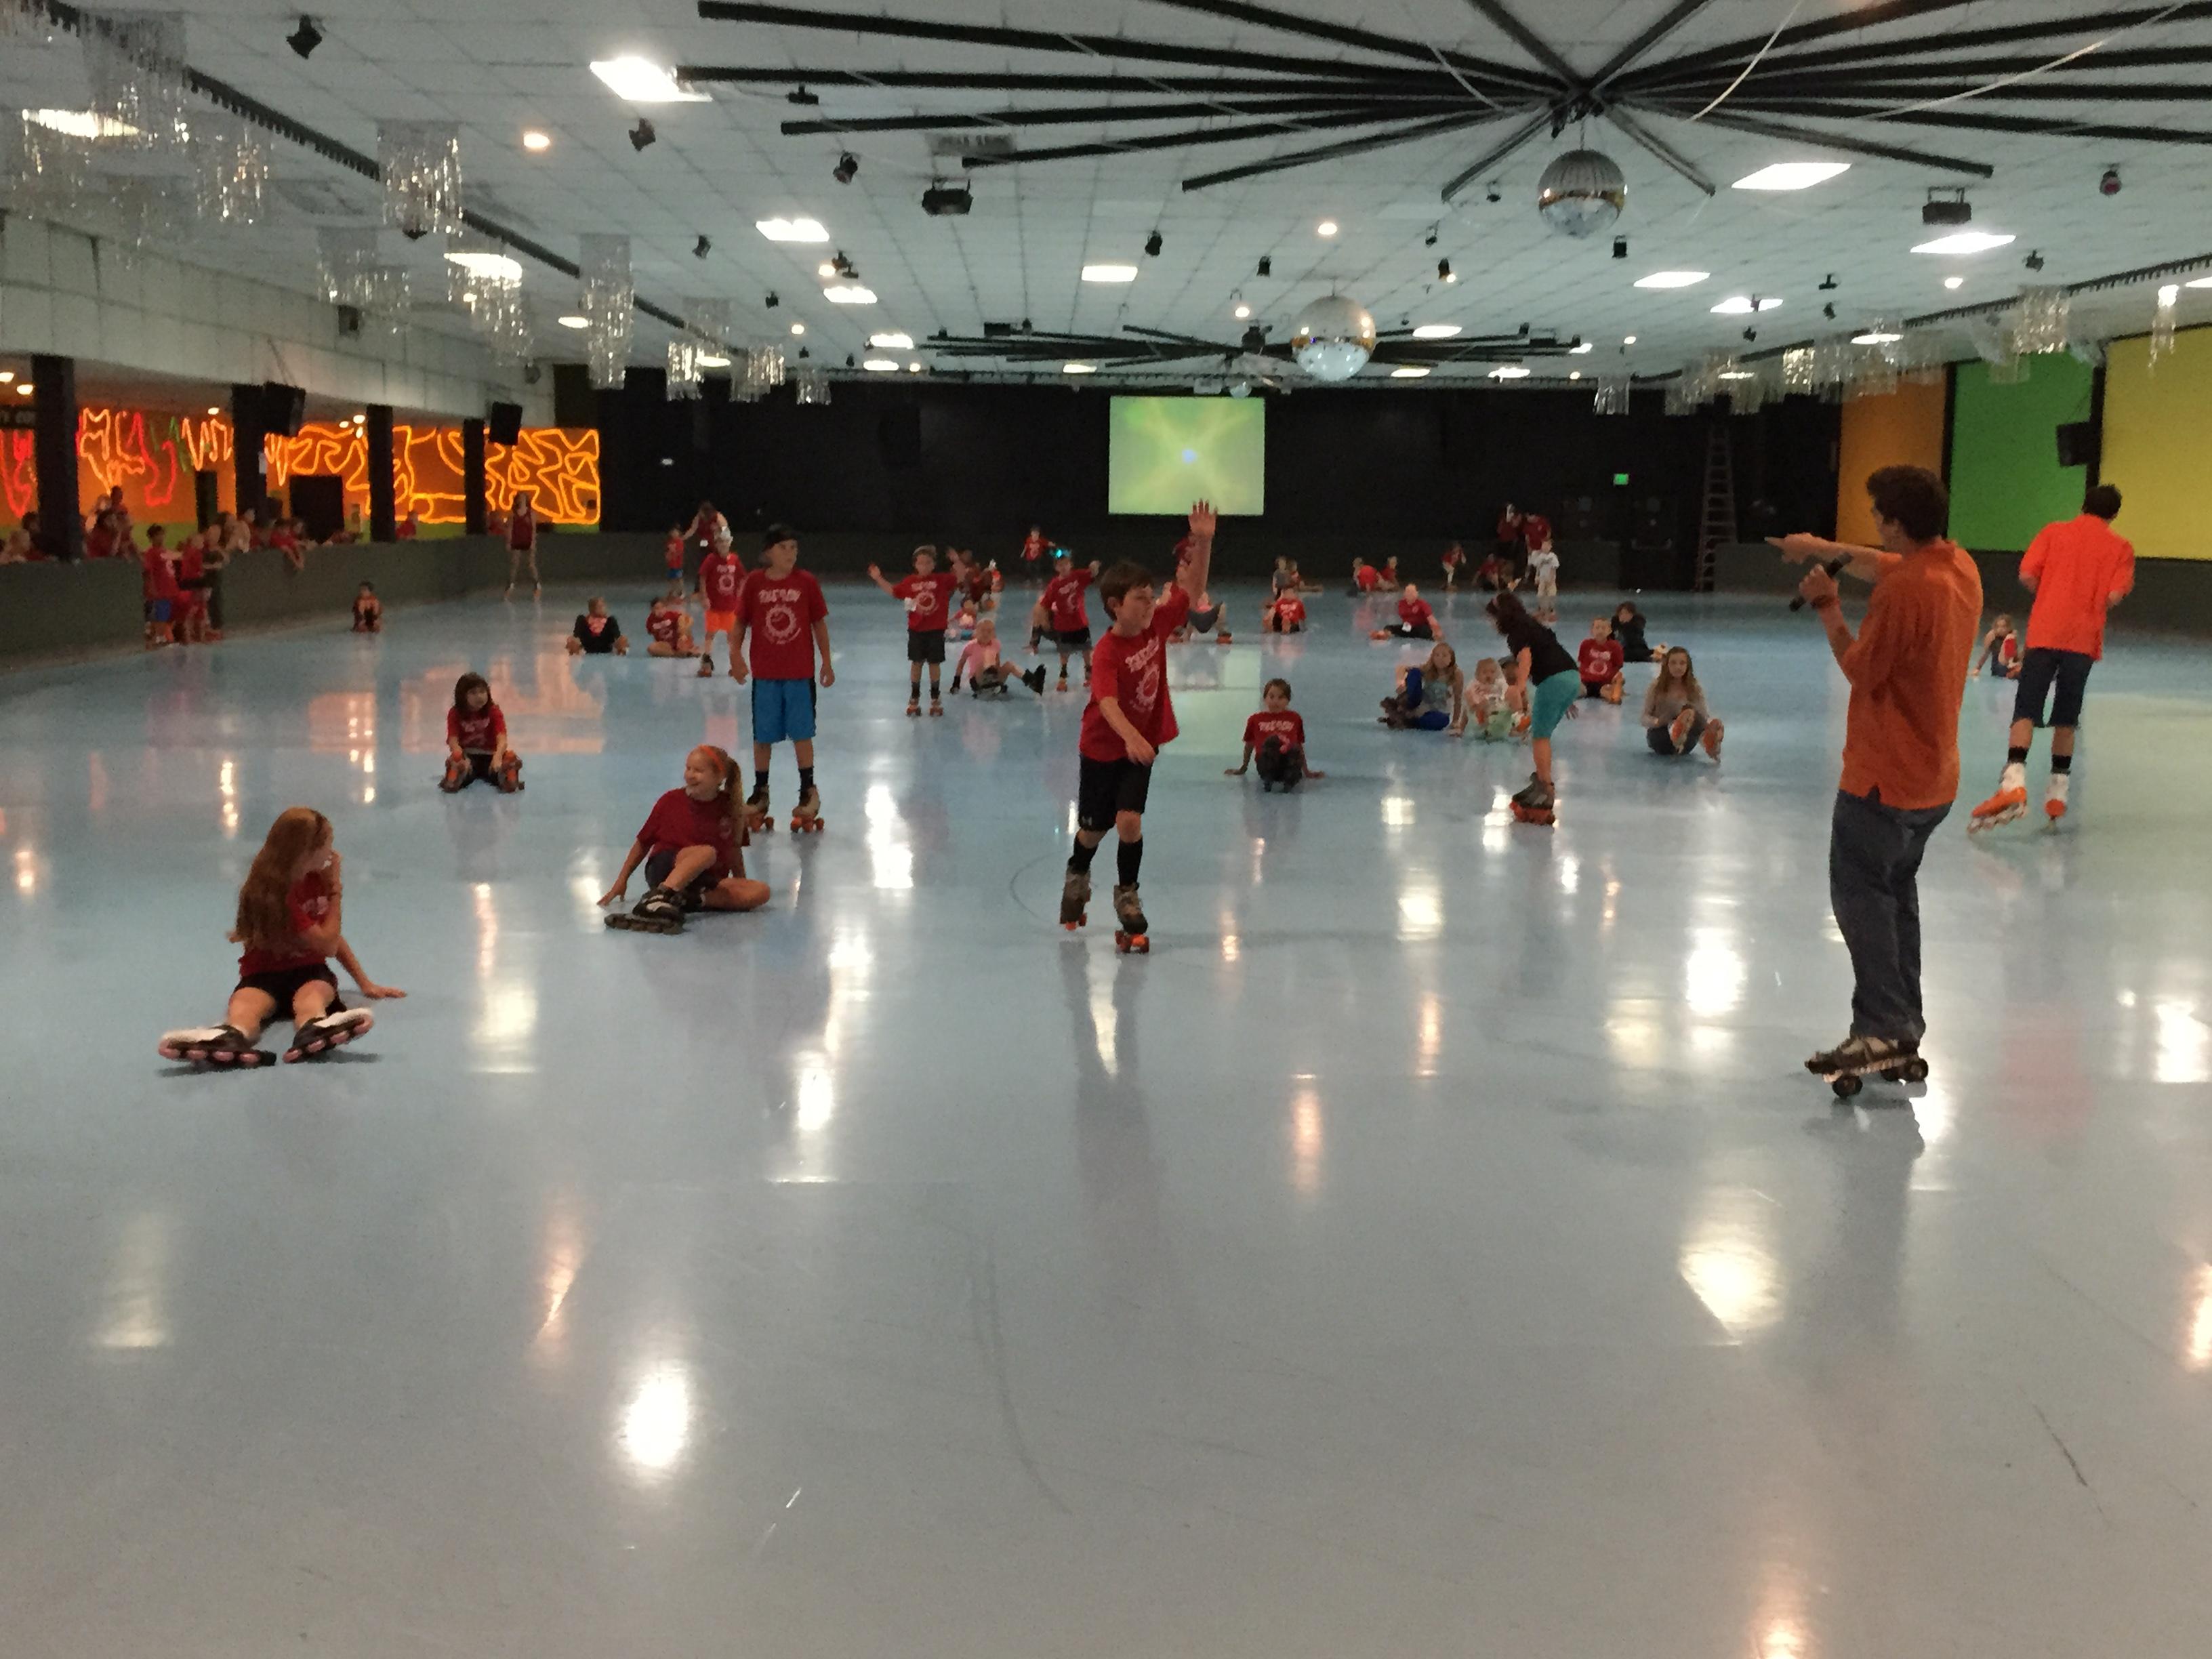 Roller skating rink rohnert park - Session 9 Cal Skate 4